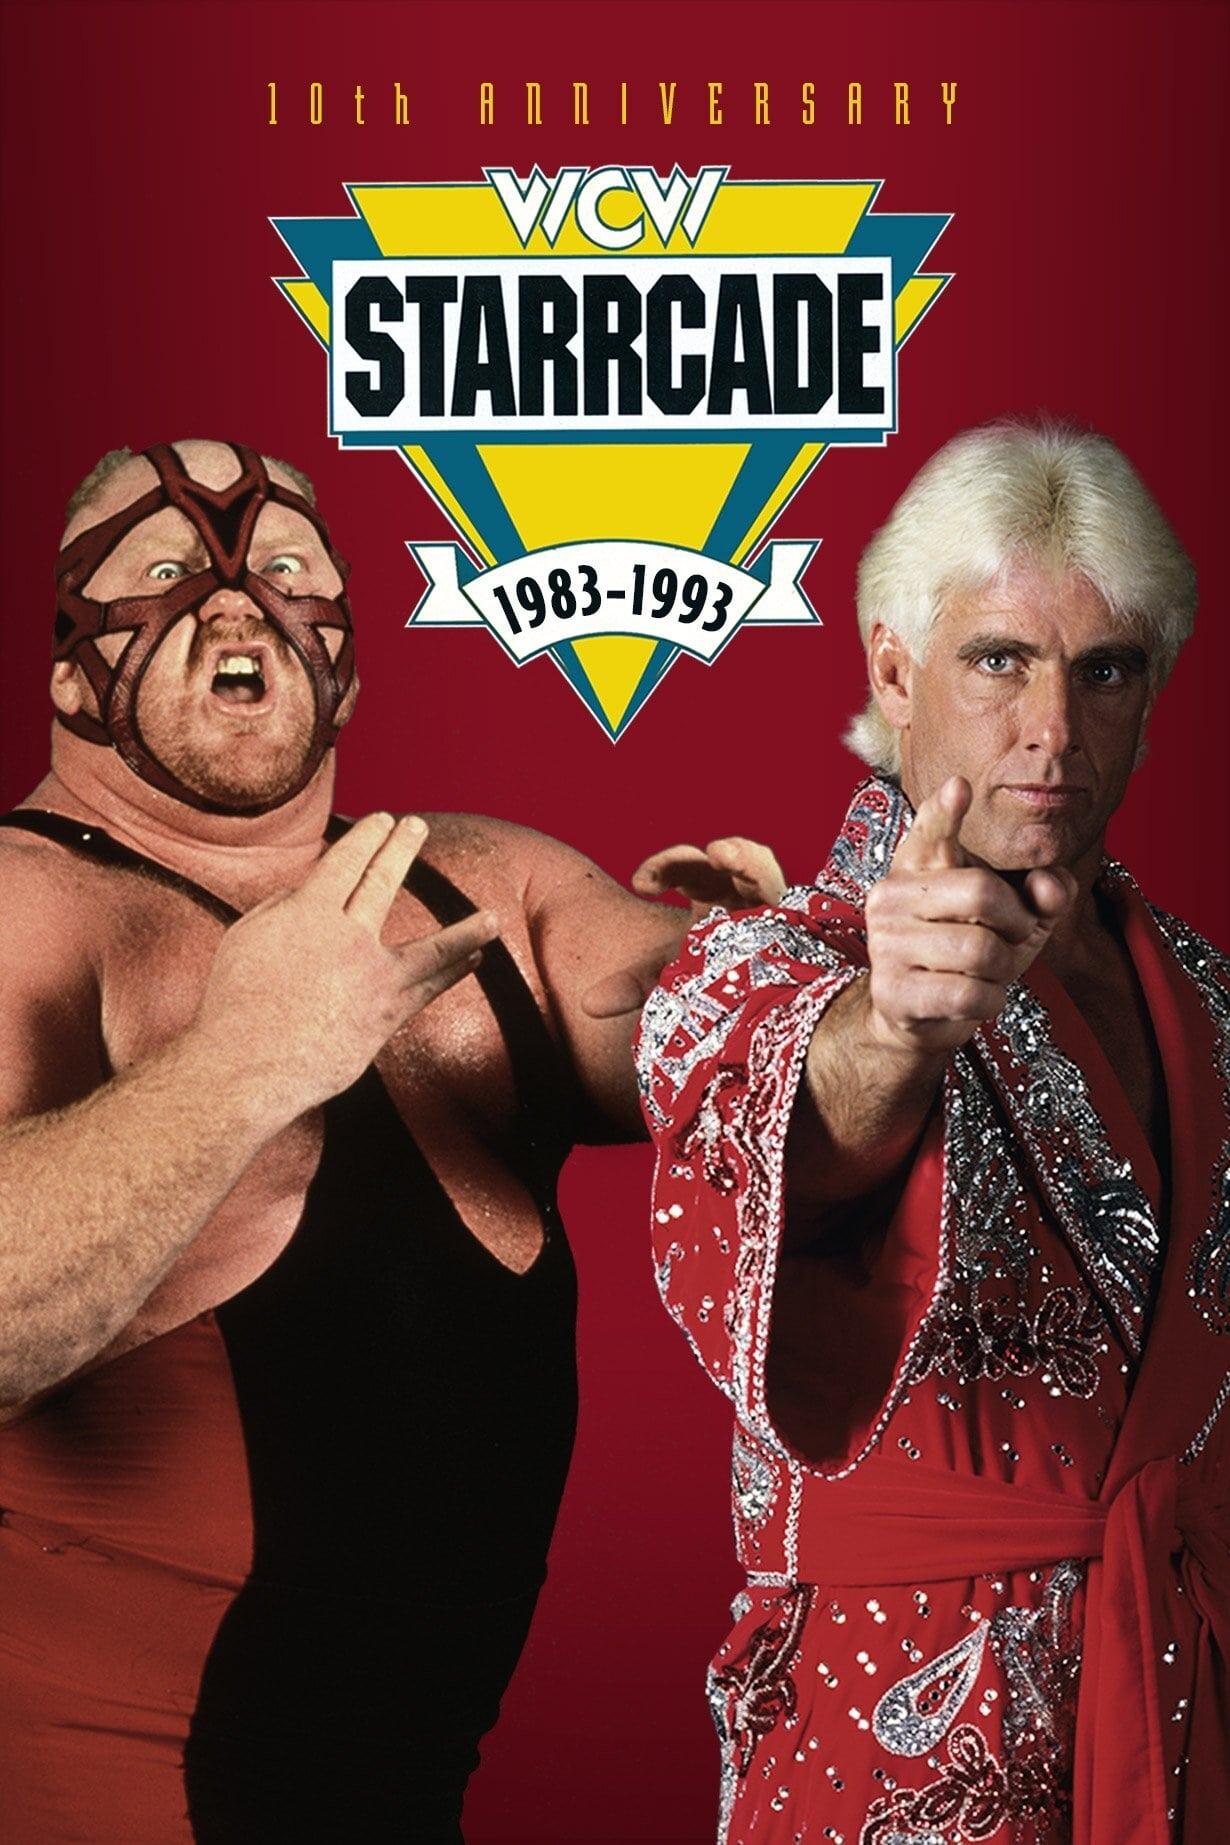 WCW Starrcade 1993